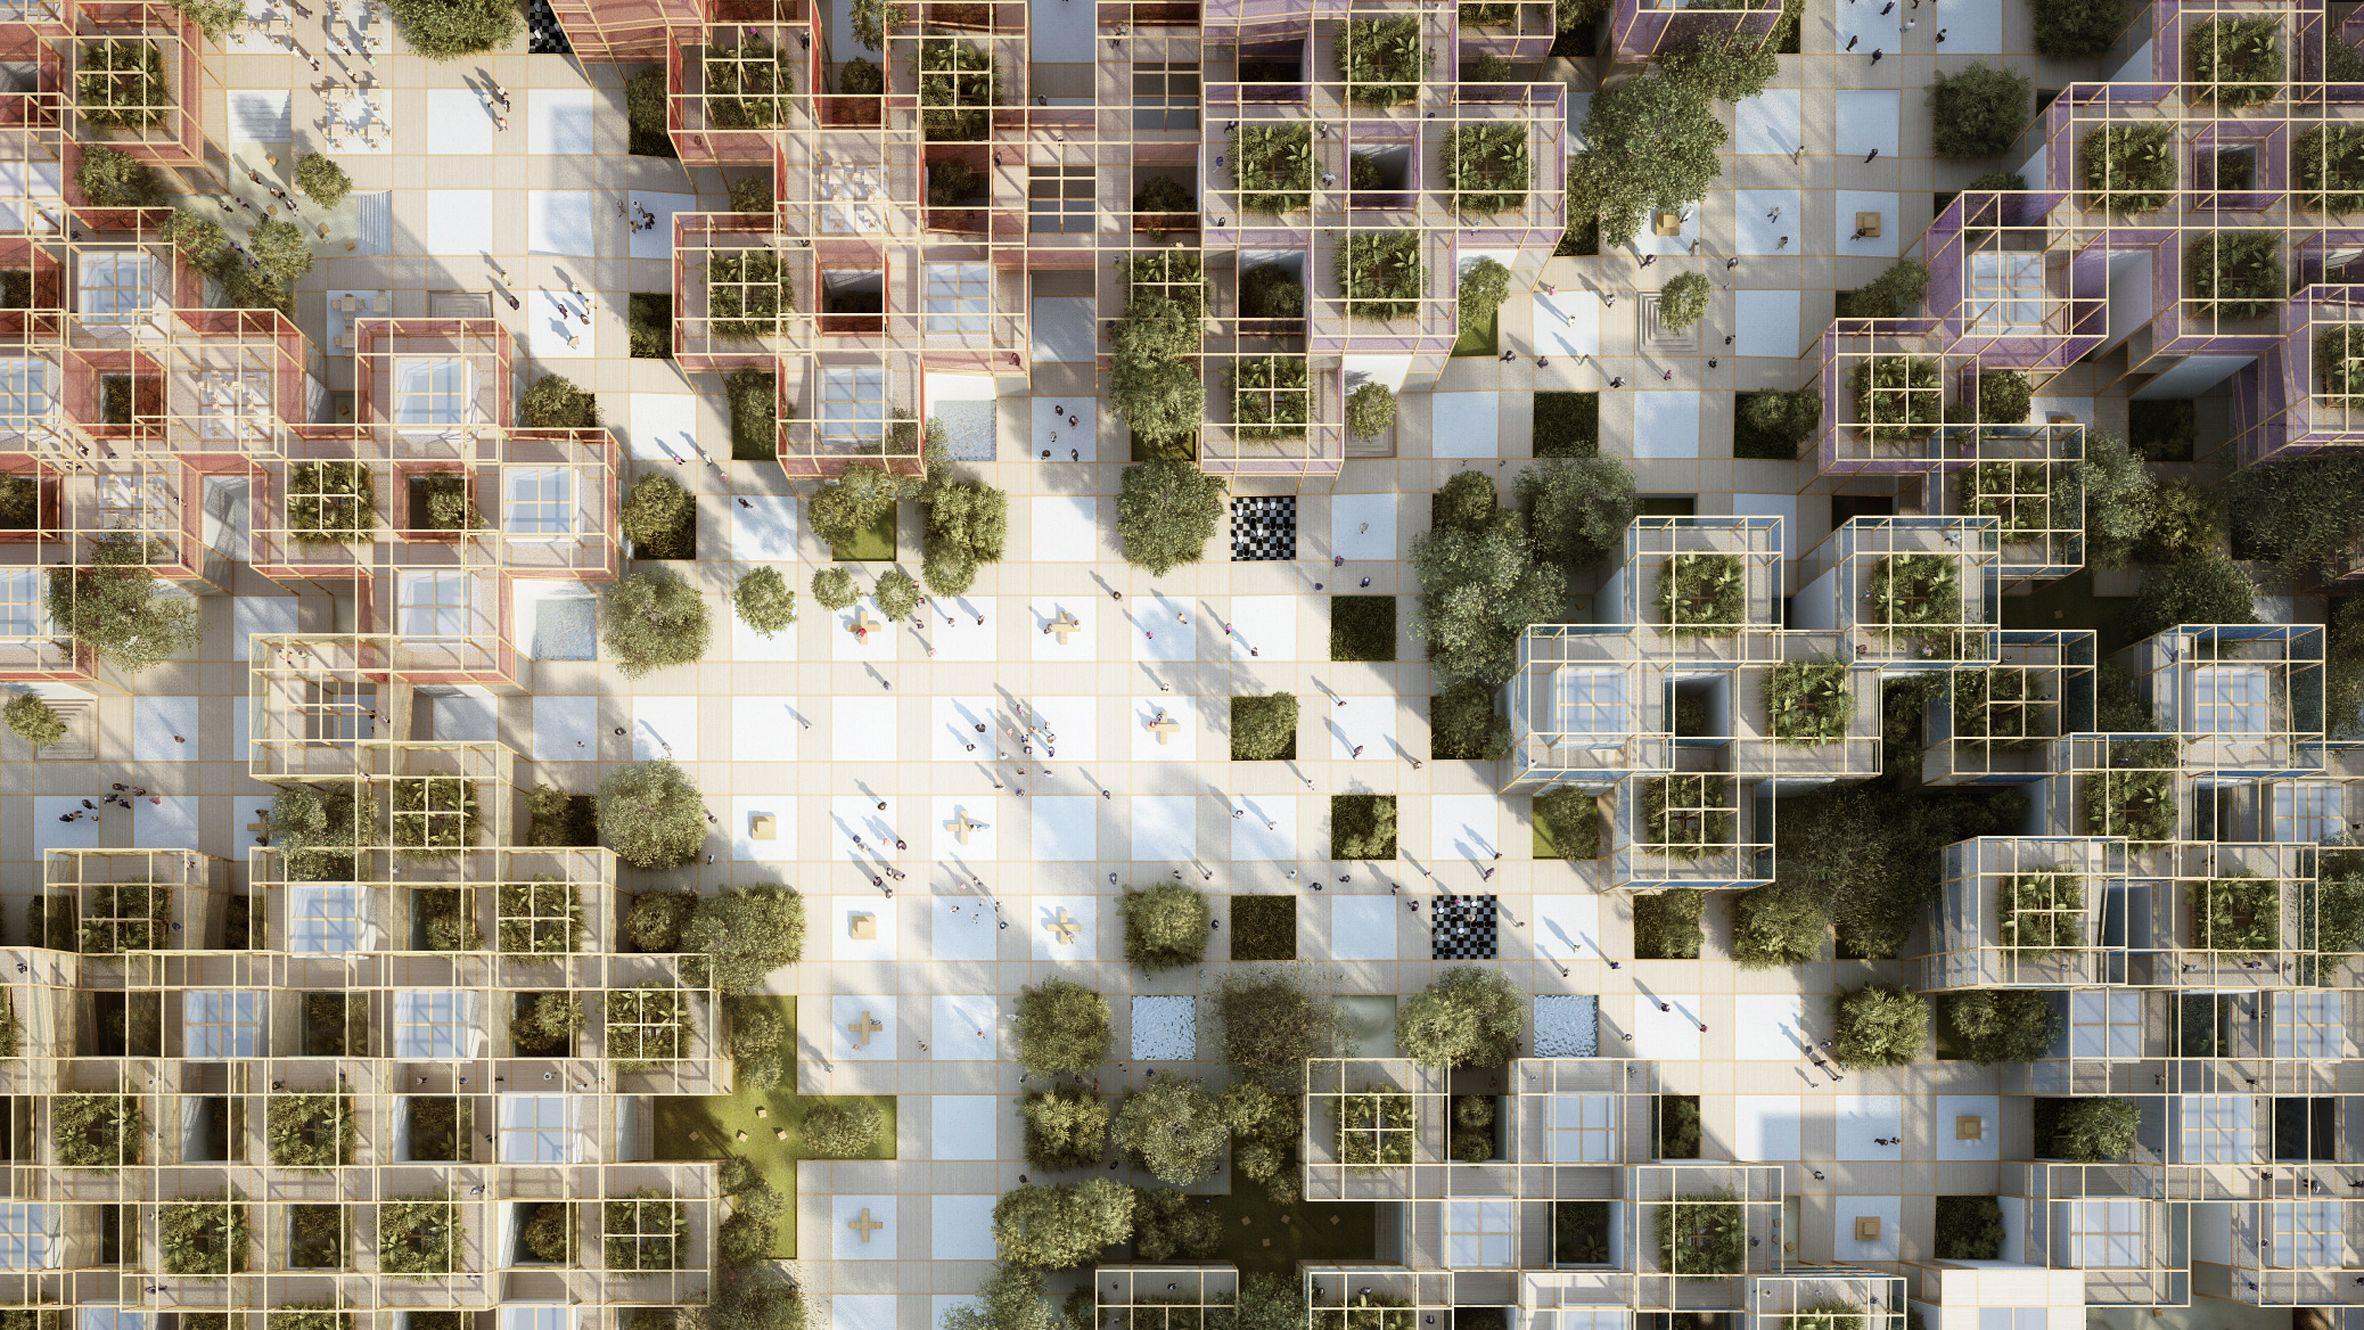 A Thousand Yards Pavilion Penda Architecture Beijing China